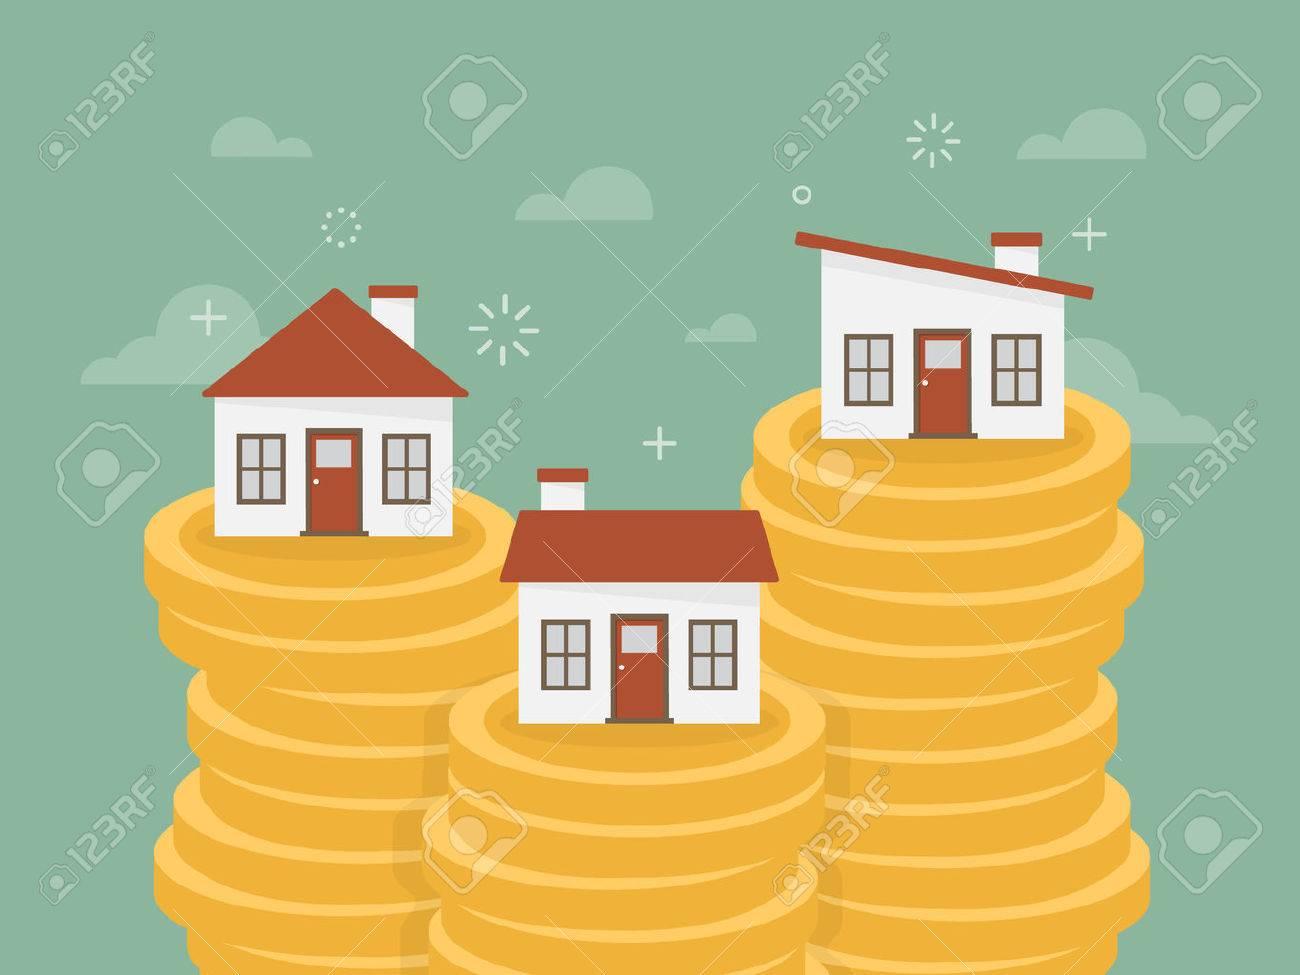 Real estate. House on stack of coins. Flat design business concept illustration. - 54429704